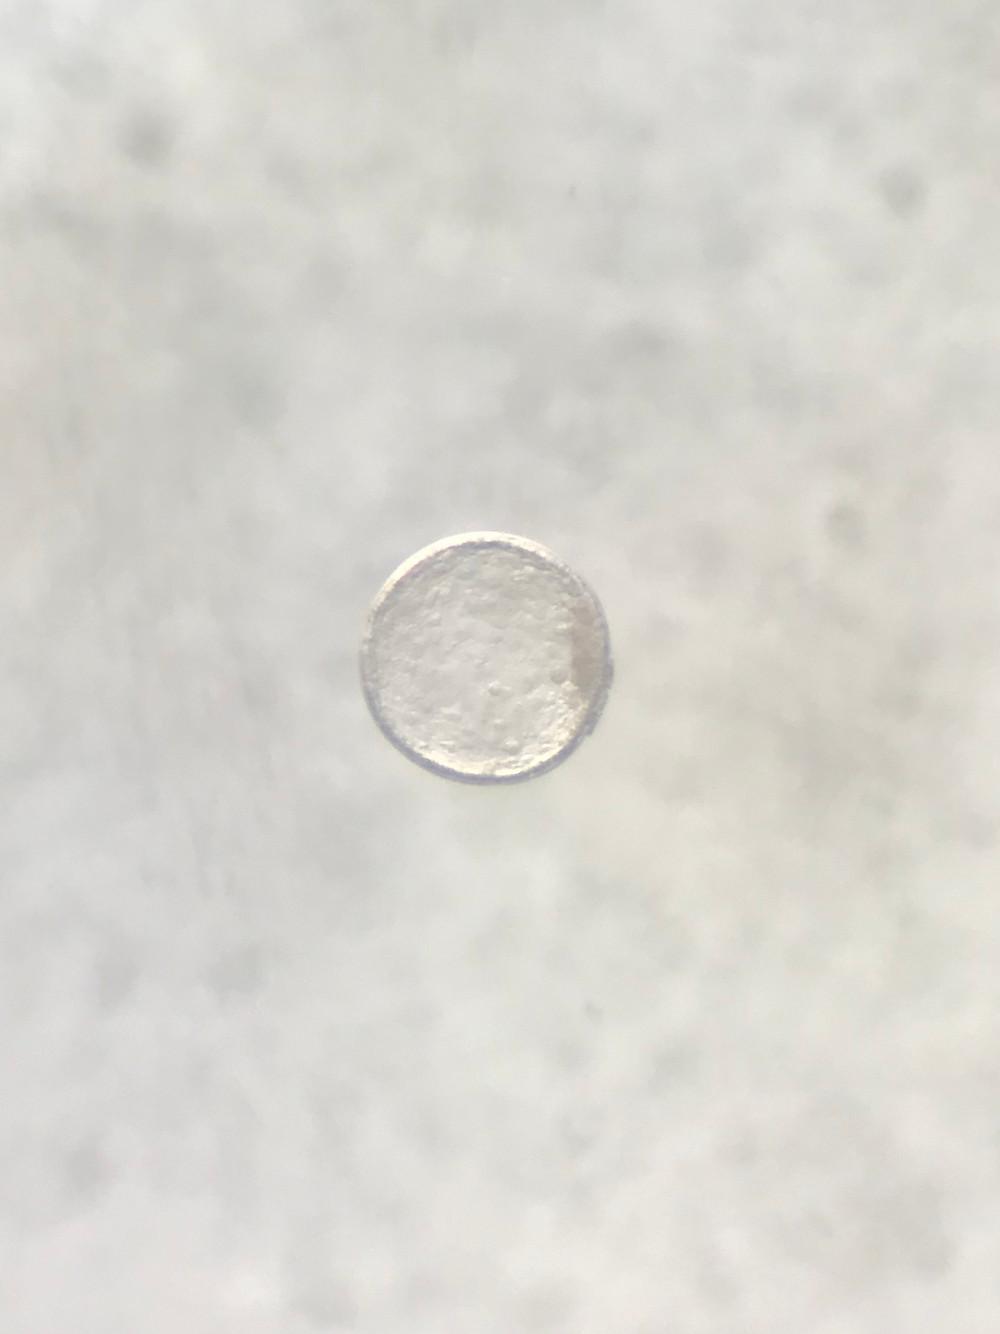 Embryo from Gaudi x Sezuan x Riccione